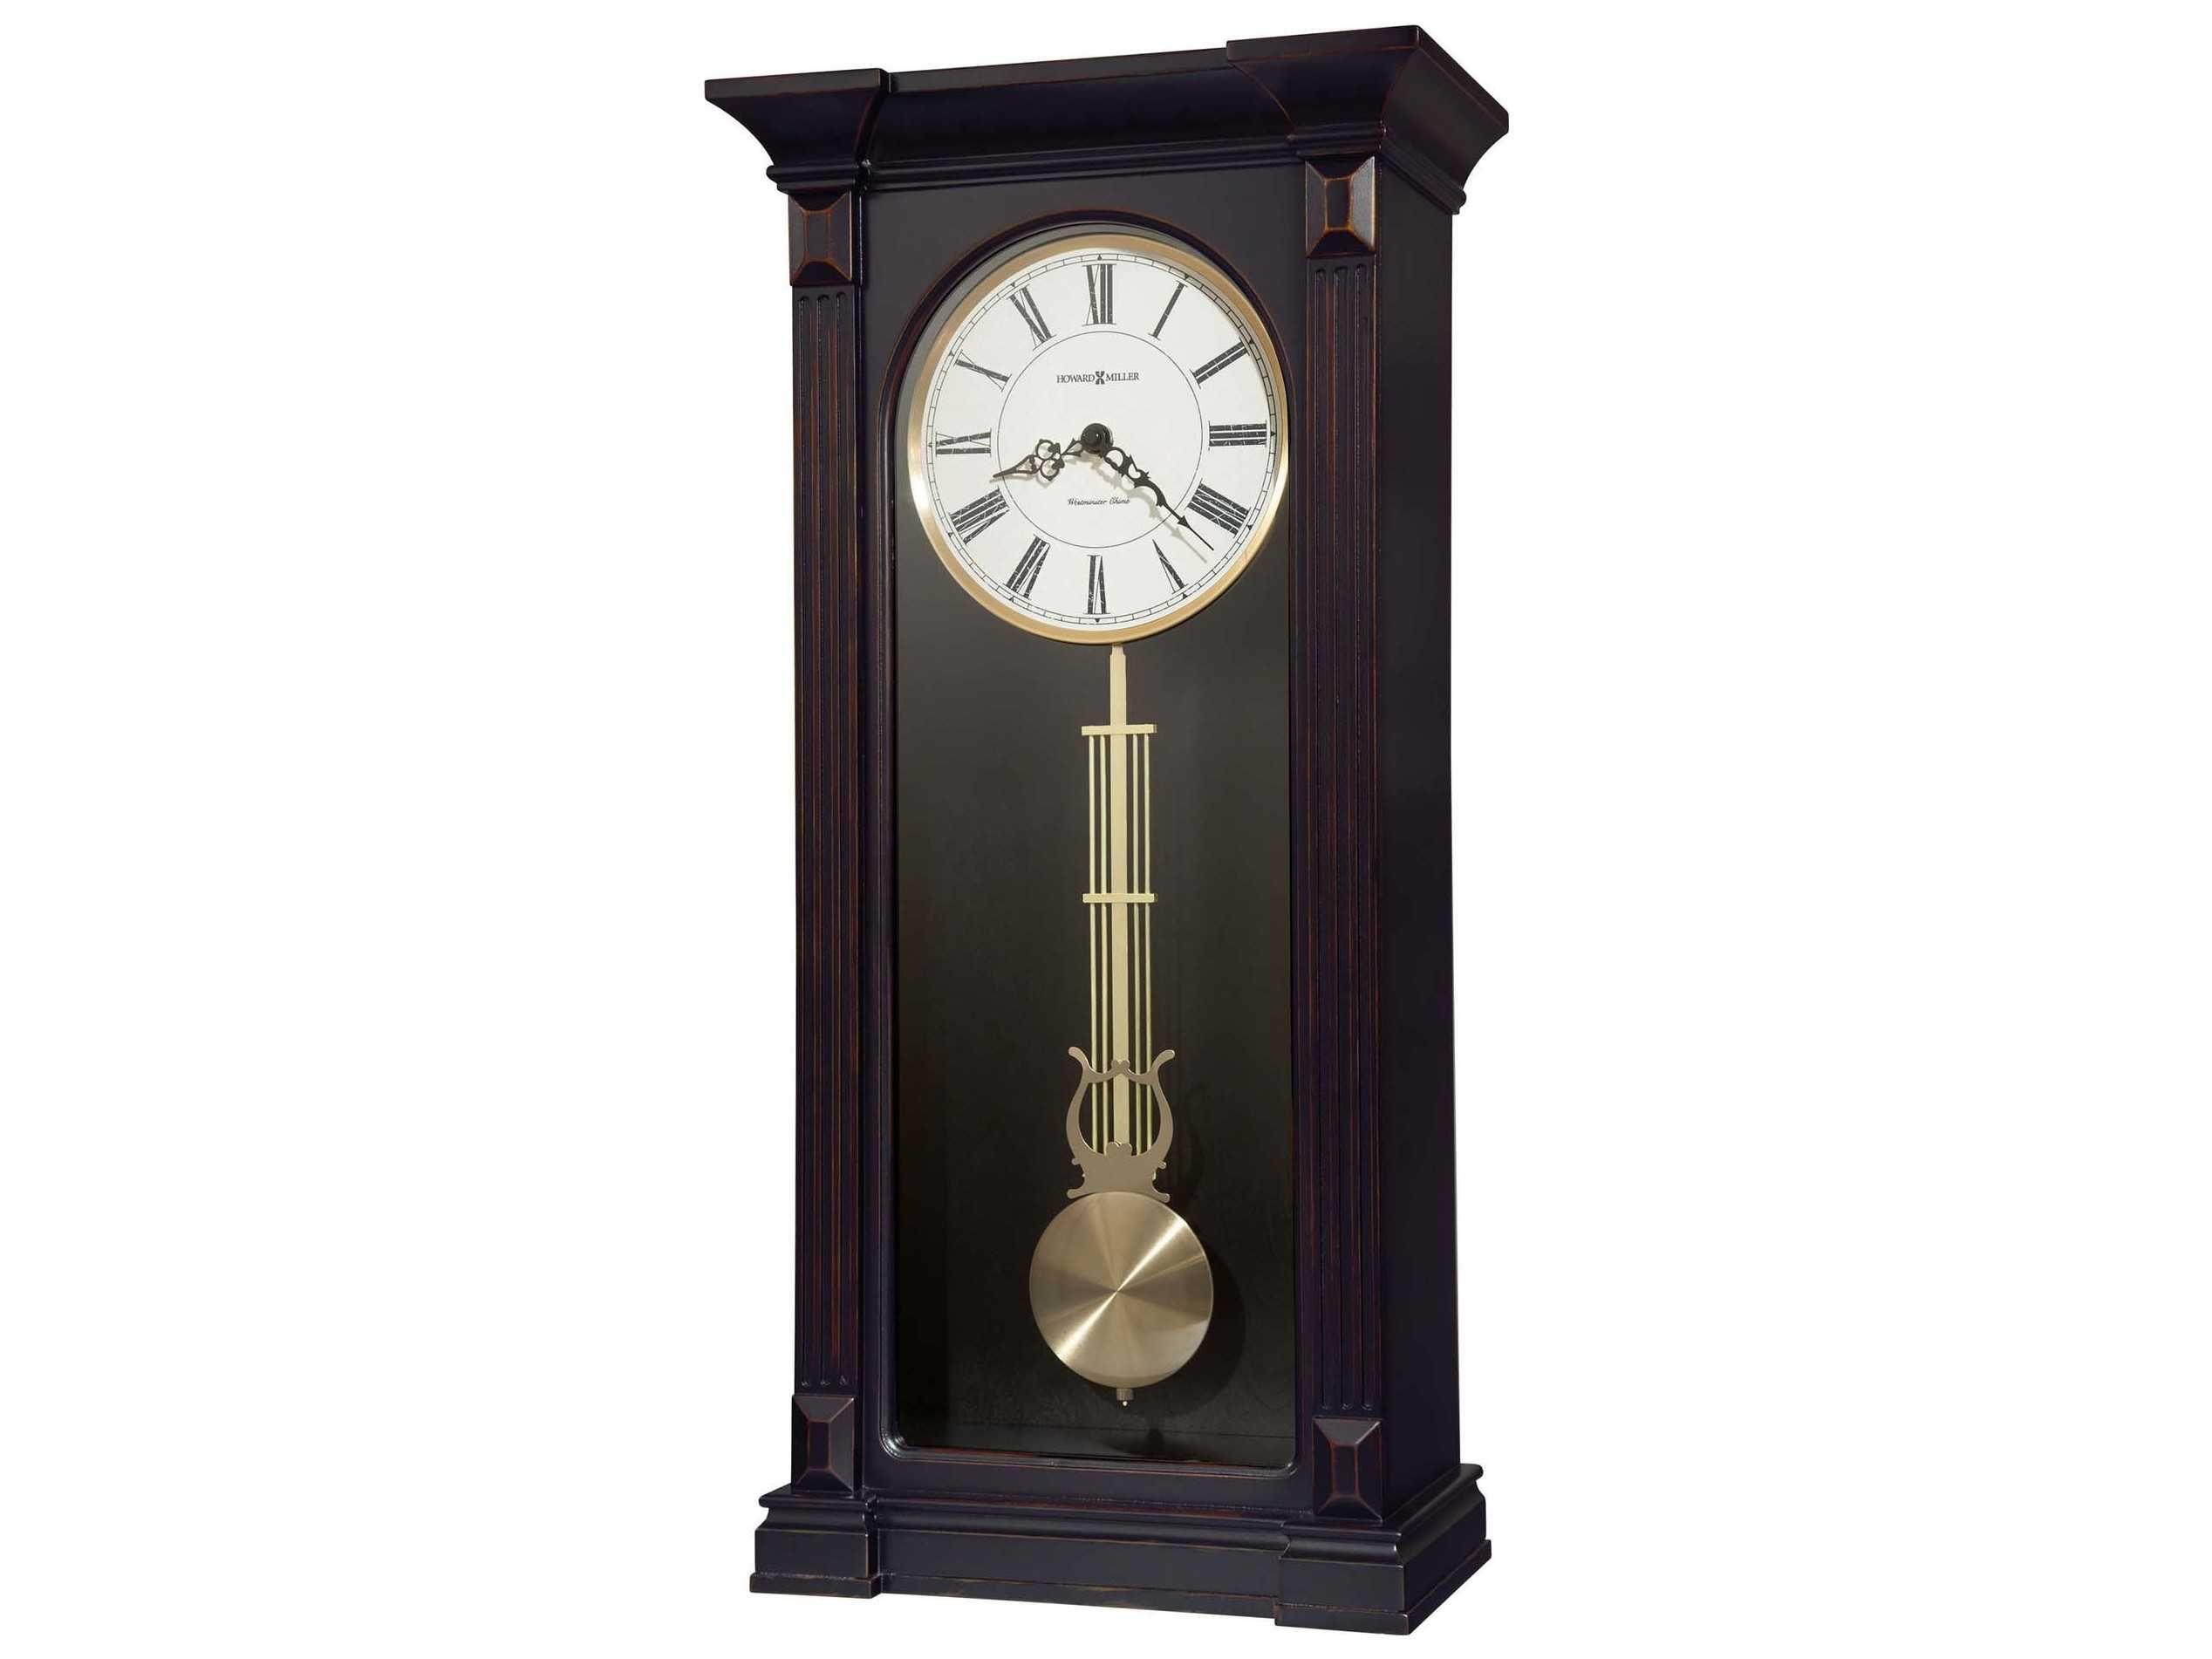 Howard Miller Mia Worn Black Chiming Wall Clock Chiming Wall Clocks Wall Clock Pendulum Wall Clock